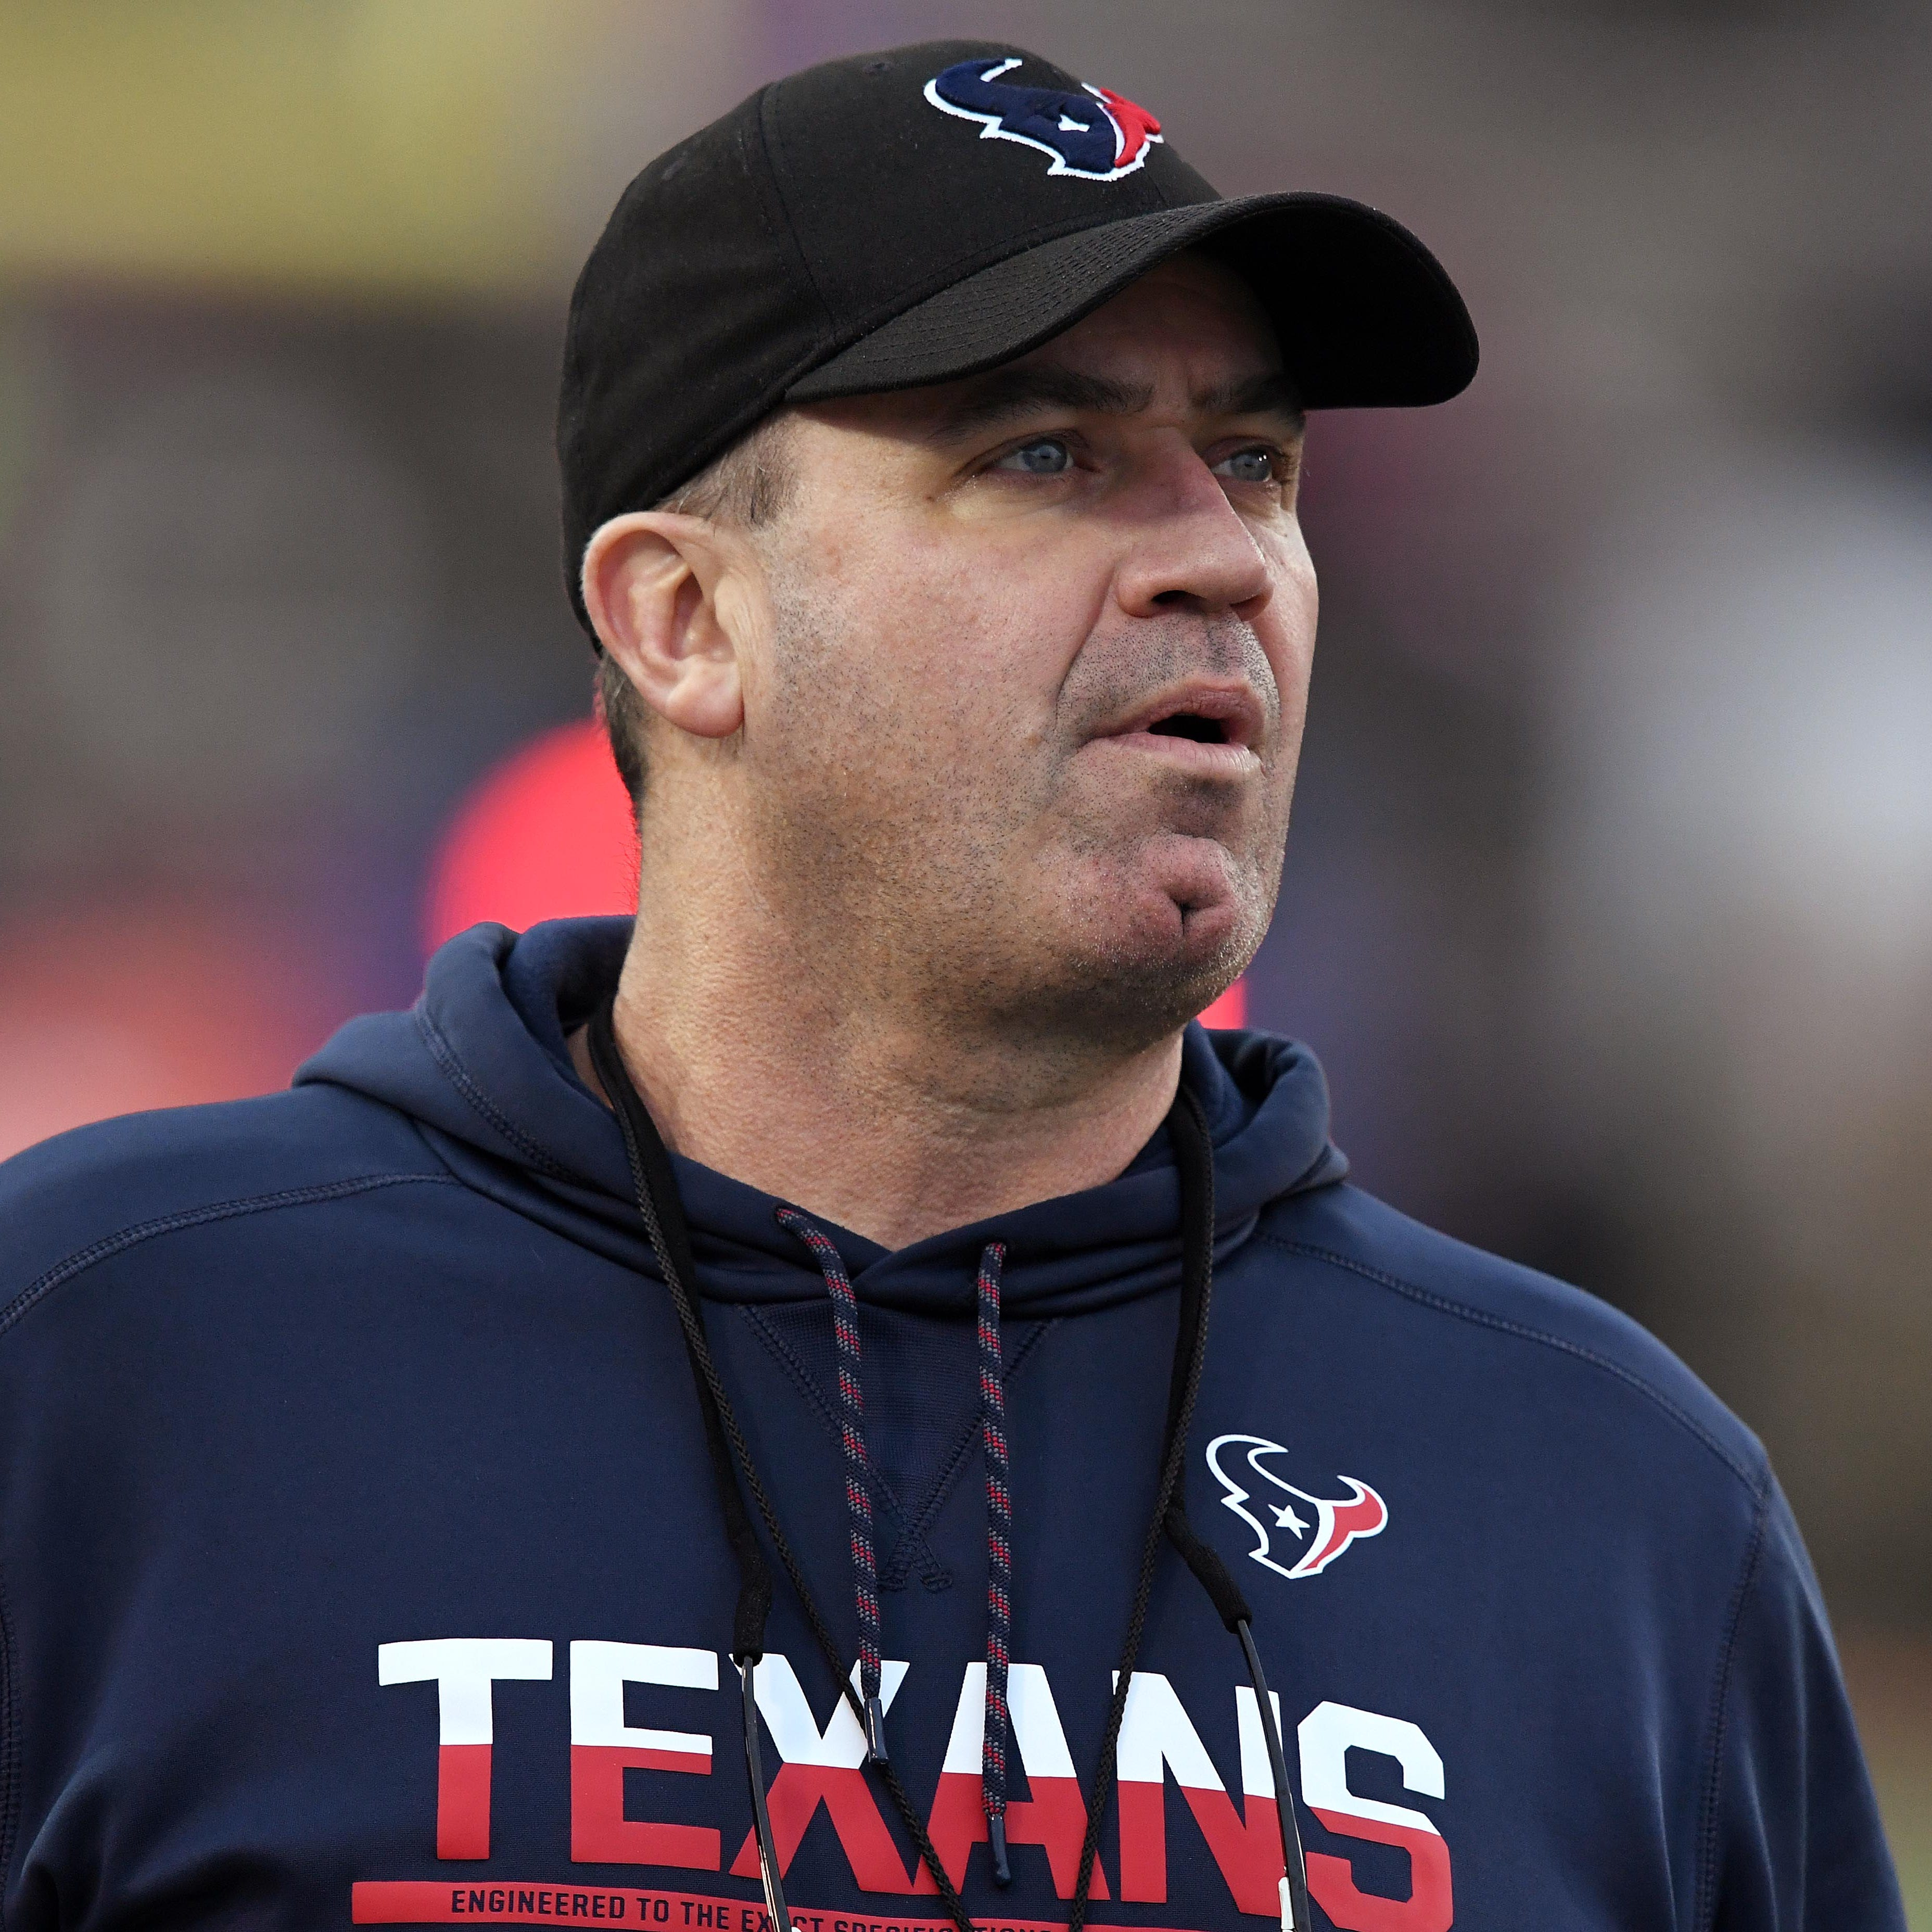 Texans coach Bill O'Brien rips superintendent for racist remark on QB Deshaun Watson